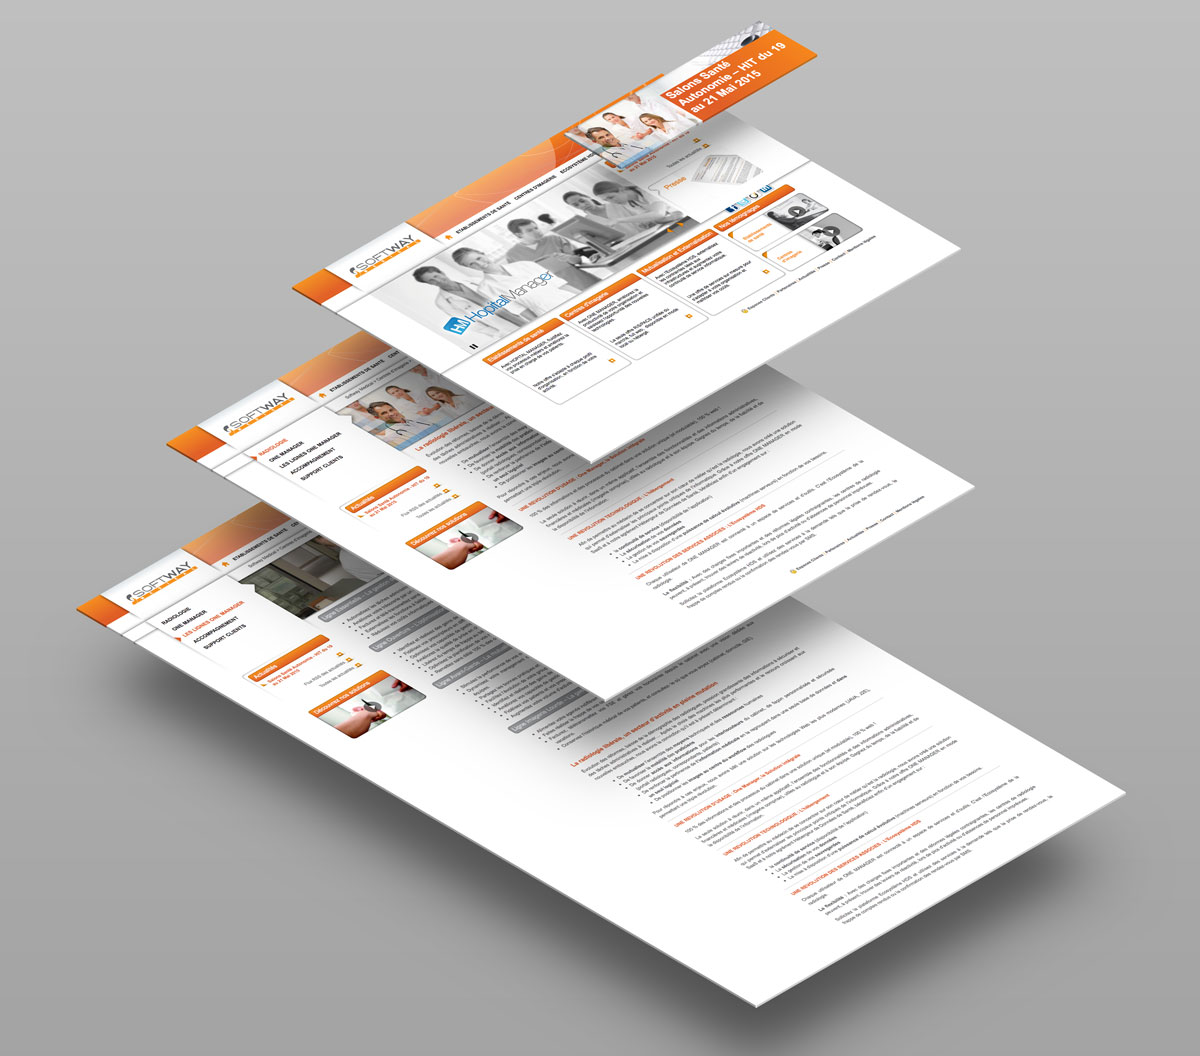 Webs-Screens-Presentation-Mock-up01.jpg